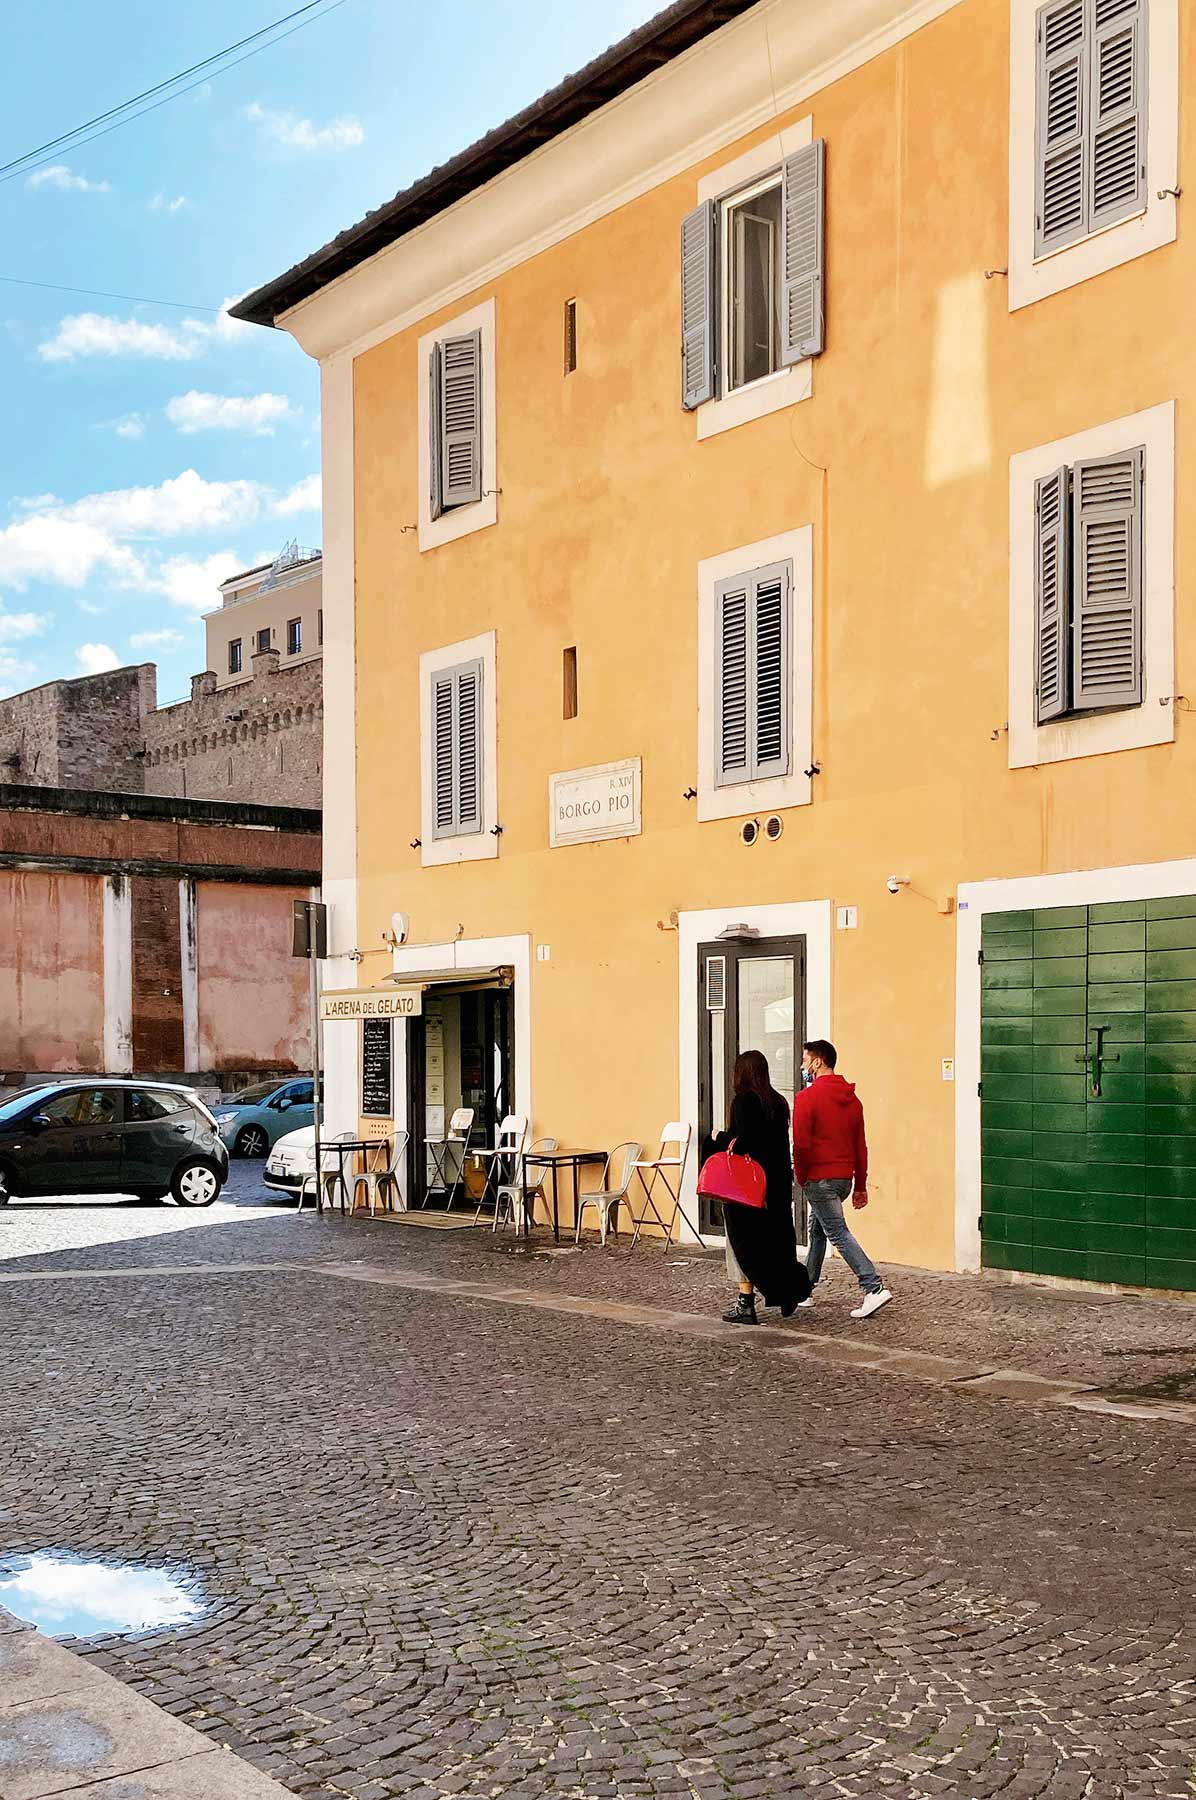 Borgo Pio, strada pedonale con sanpietrini